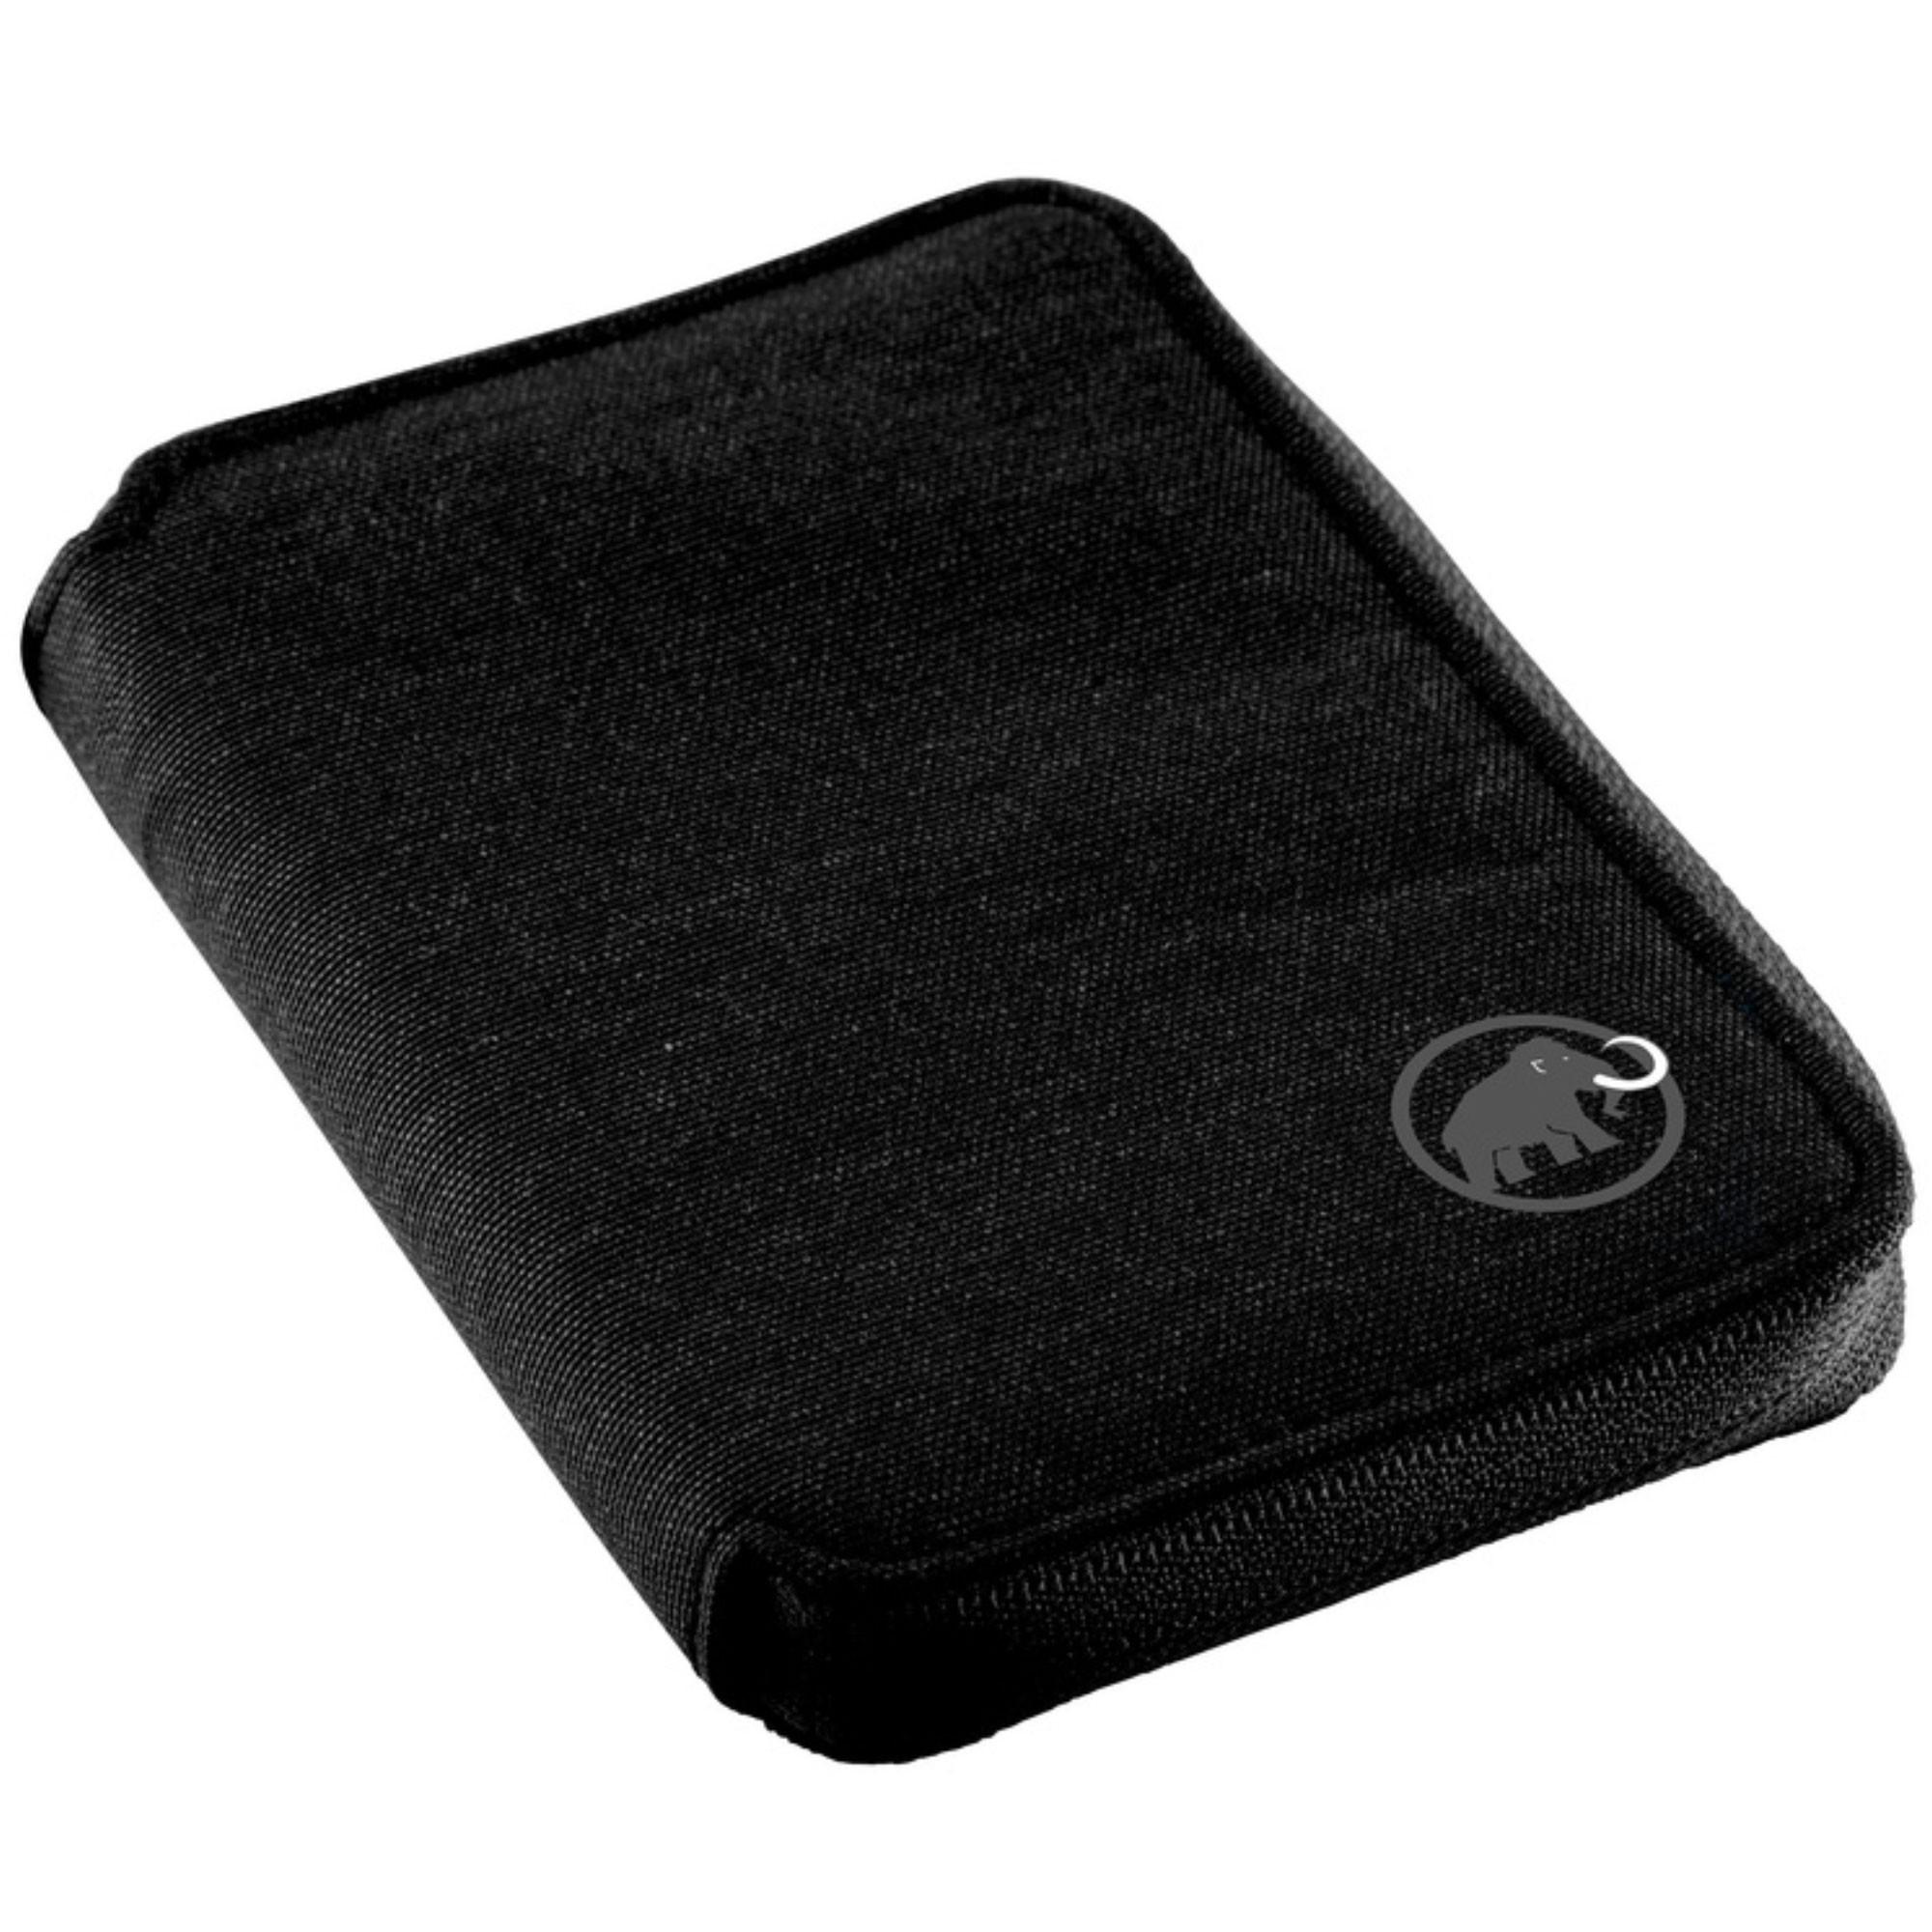 Mammut Zip Wallet - Black Melange